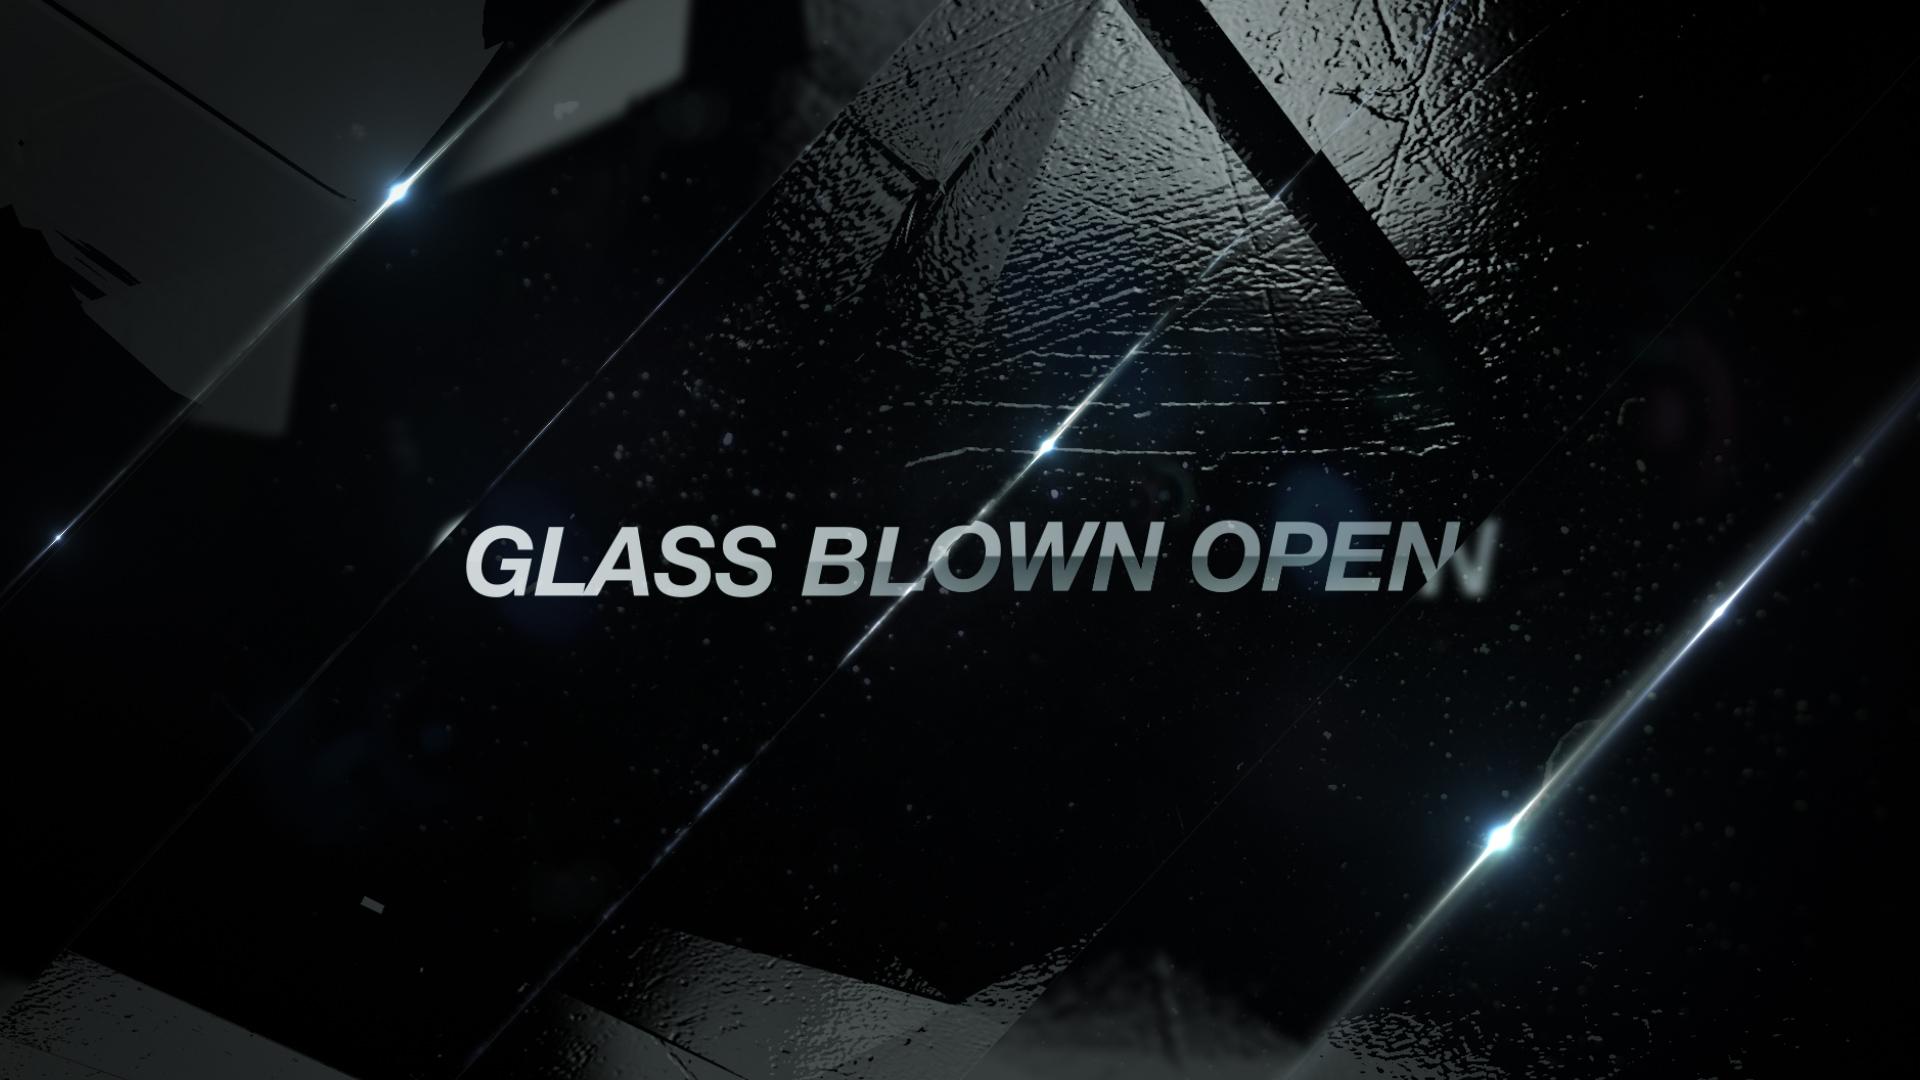 Dynamic Discs presents Glass Blown Open